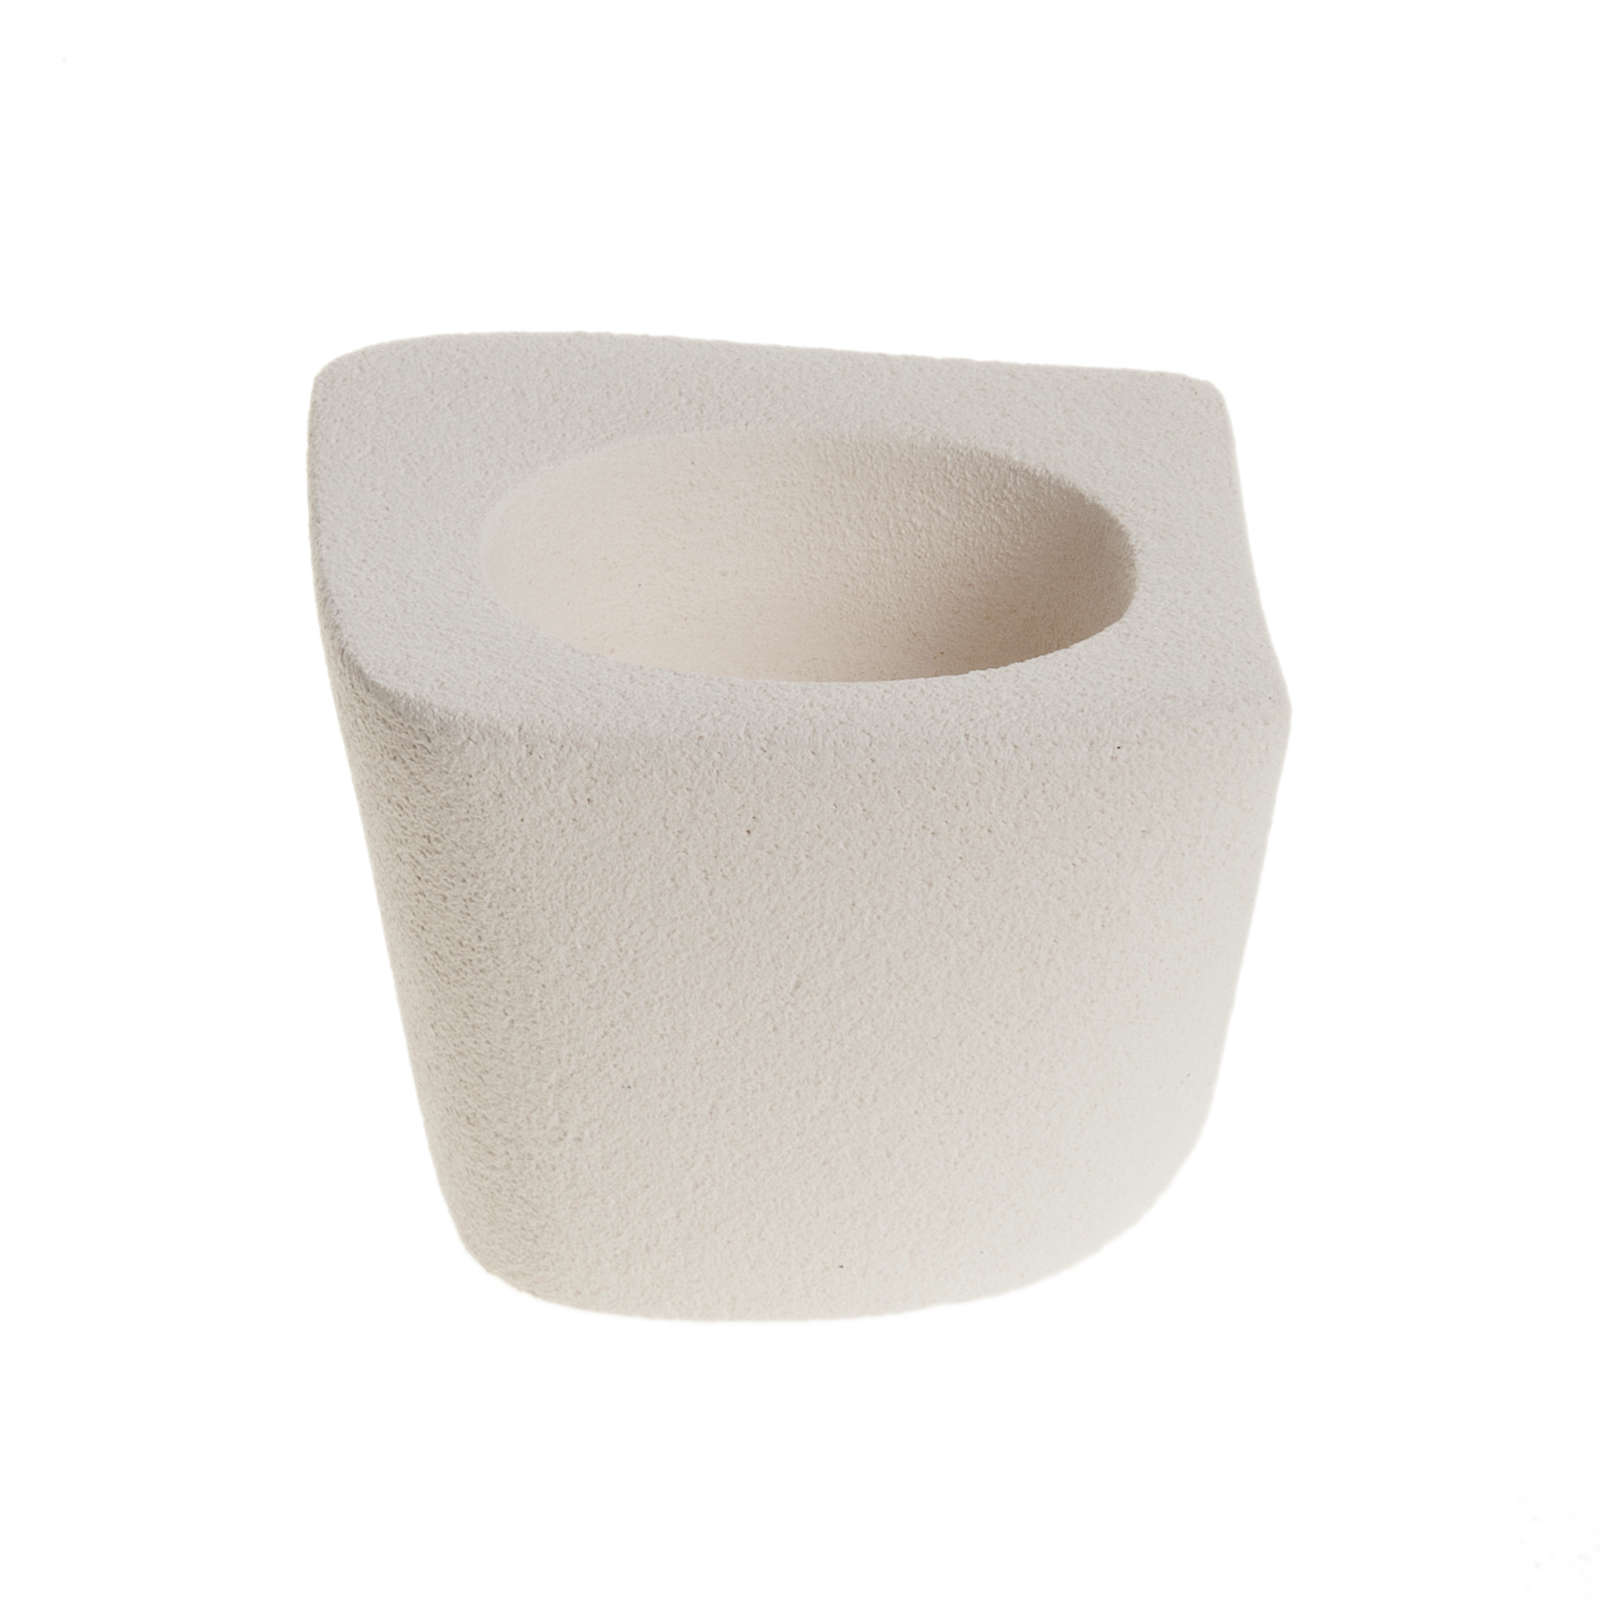 Candelero arcilla ovalado irregular 9cm 4